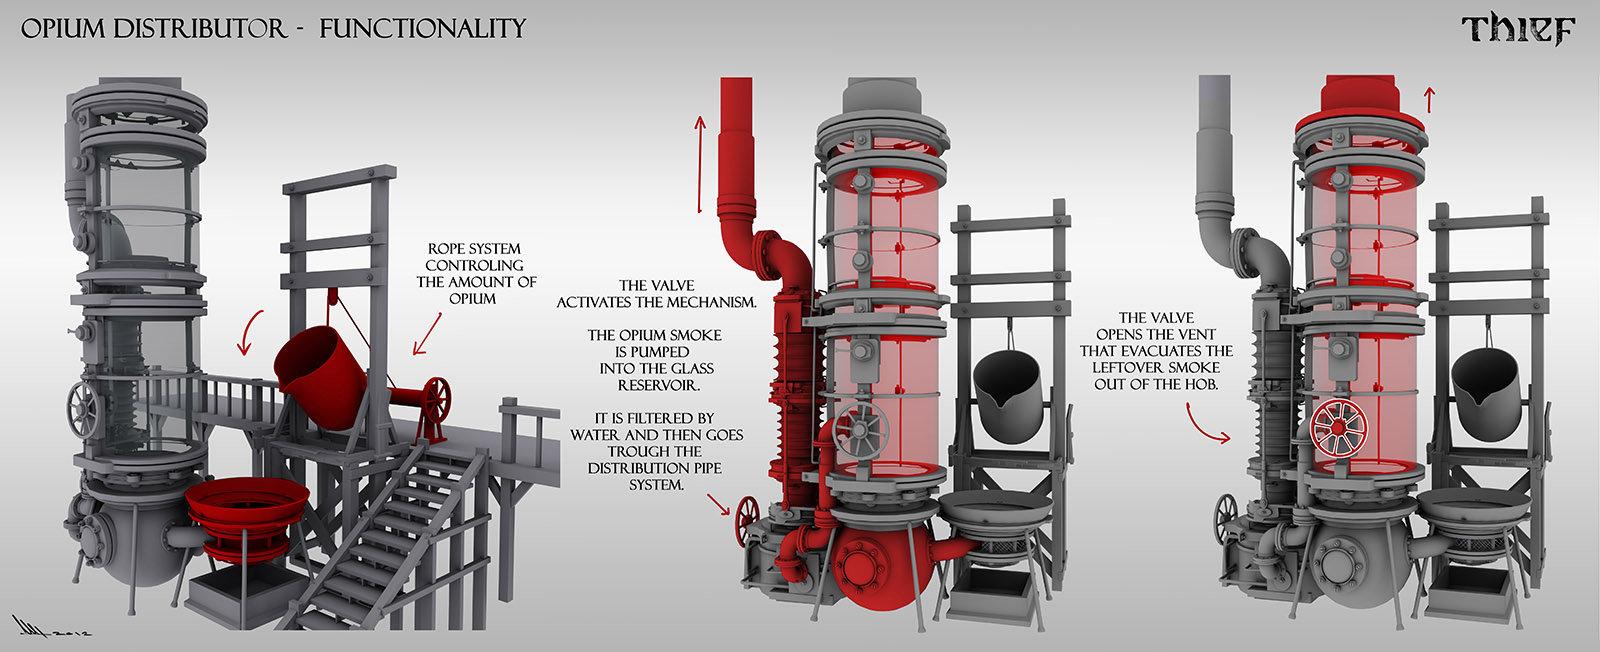 Mathieu latour duhaime hob opium distributor functionality 2012s